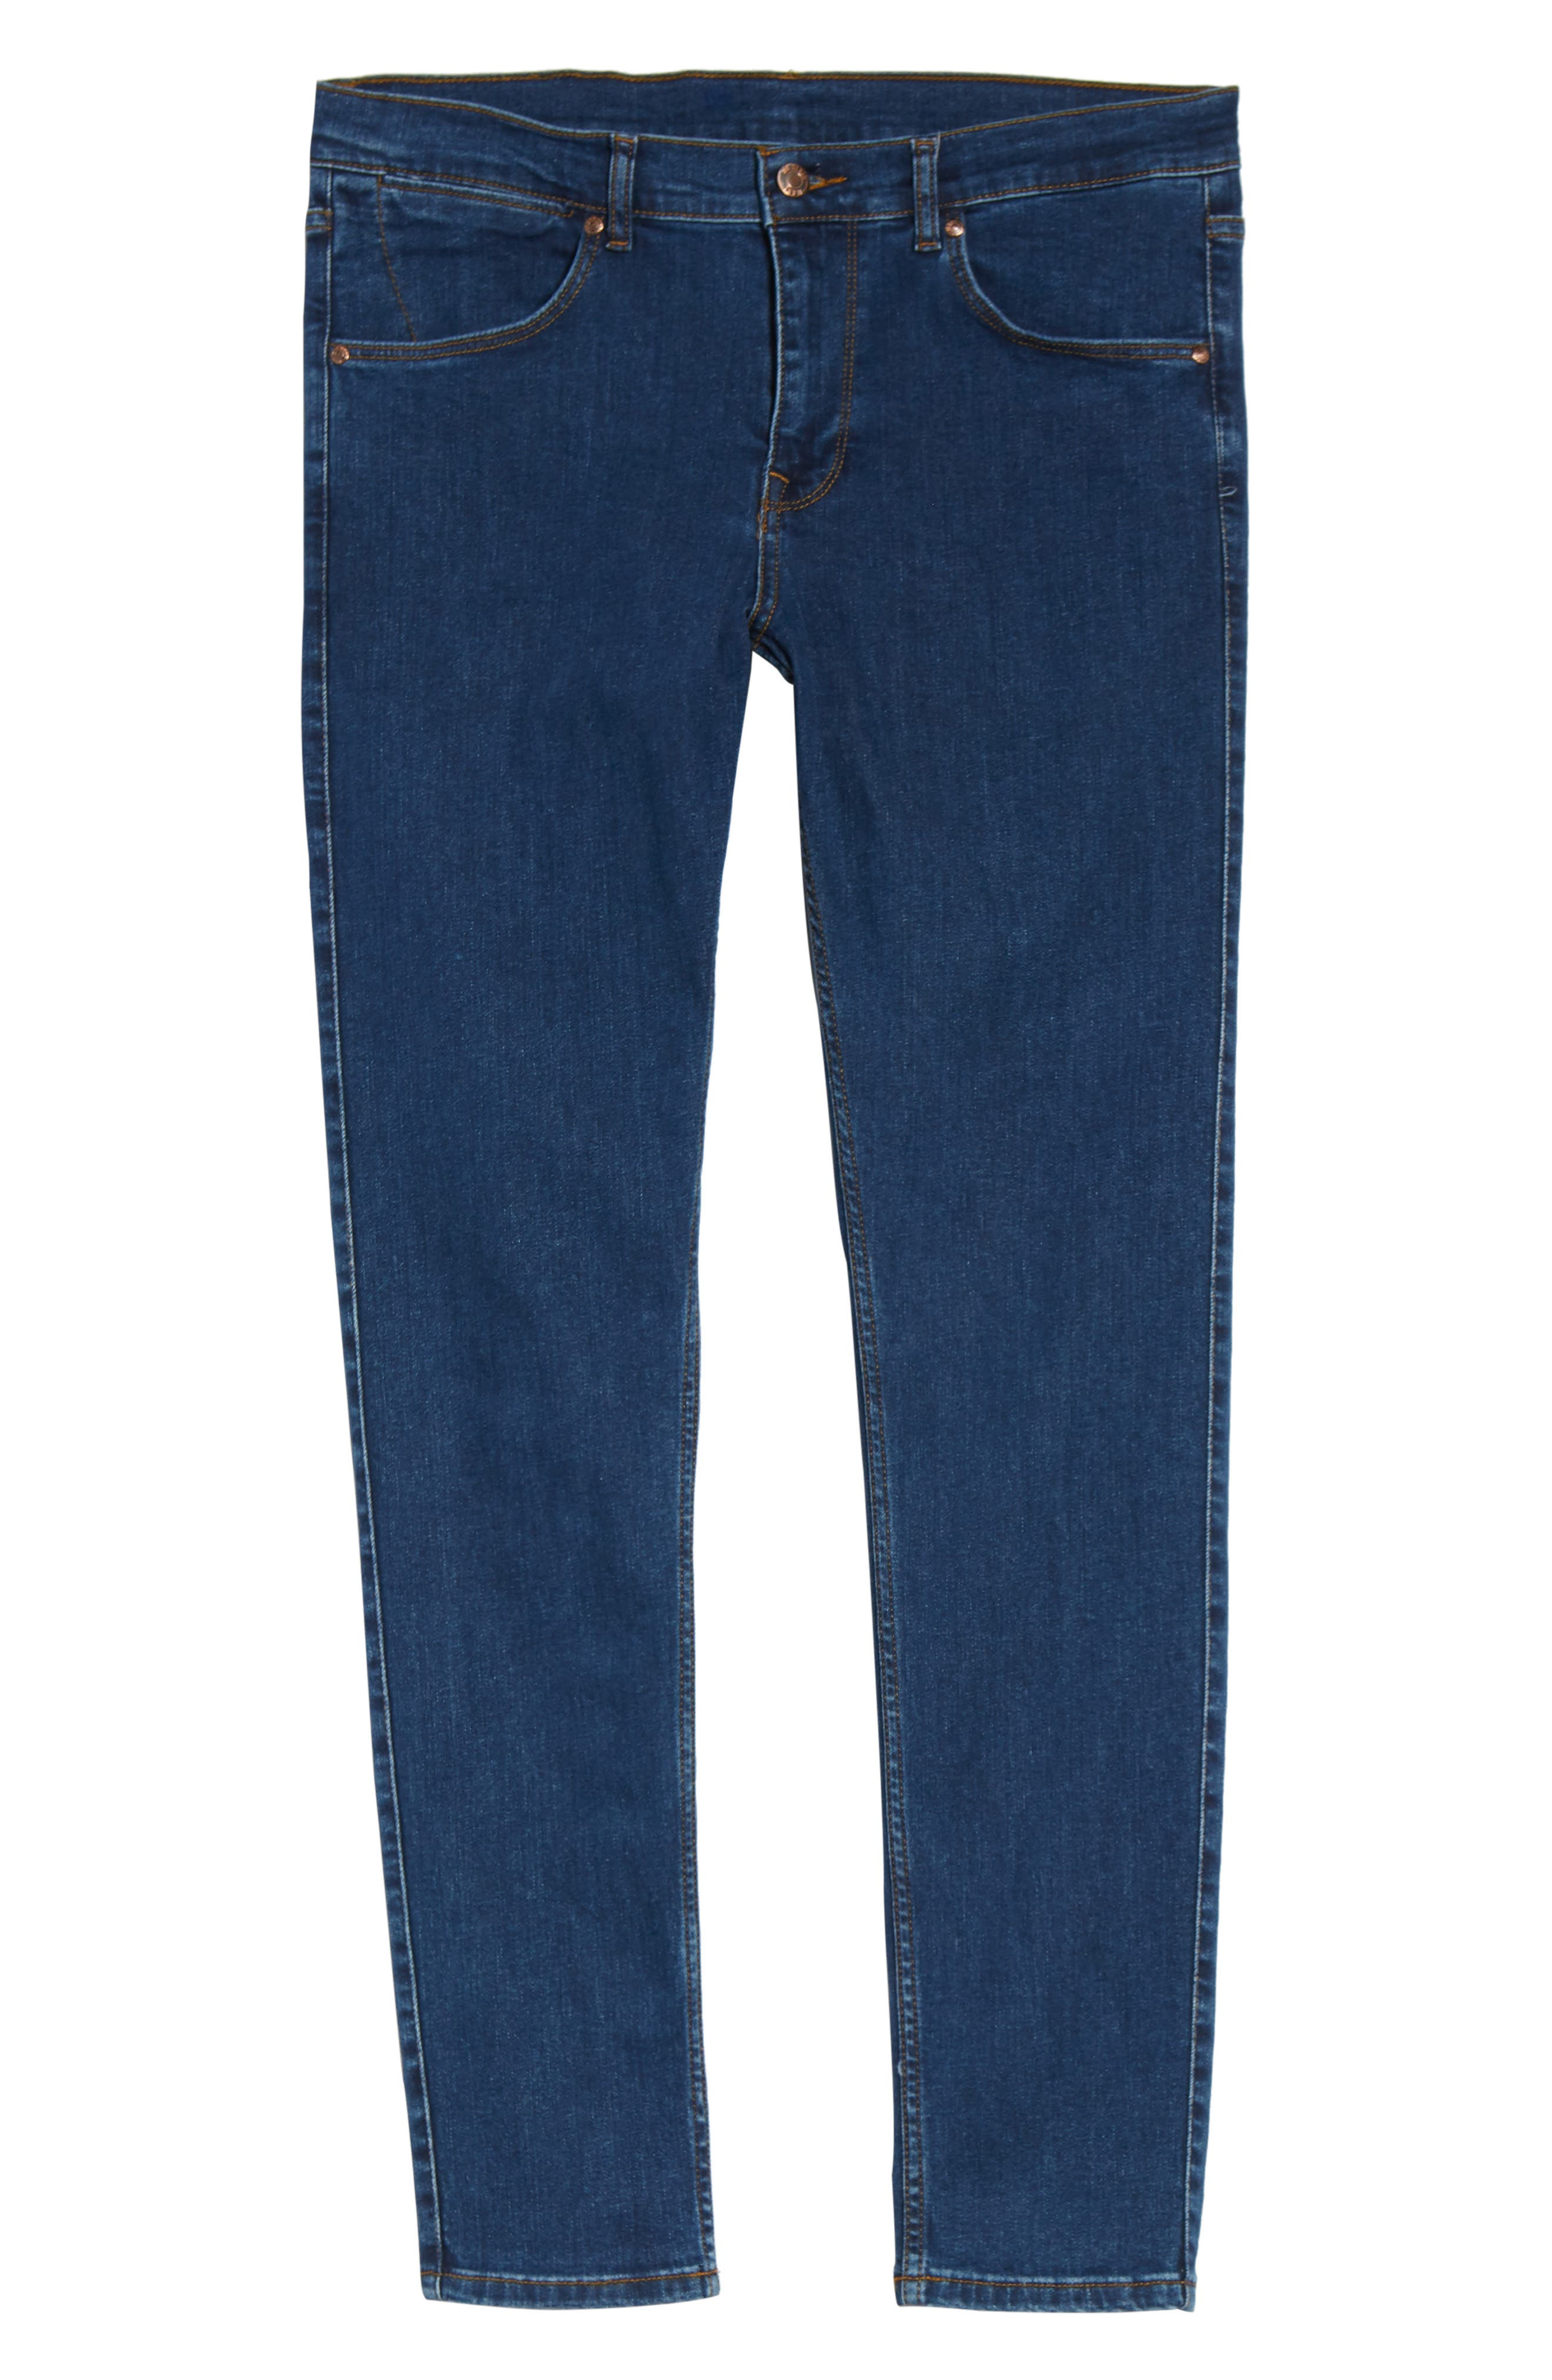 Clark Slim Straight Leg Jeans,                             Alternate thumbnail 6, color,                             Mid Retro